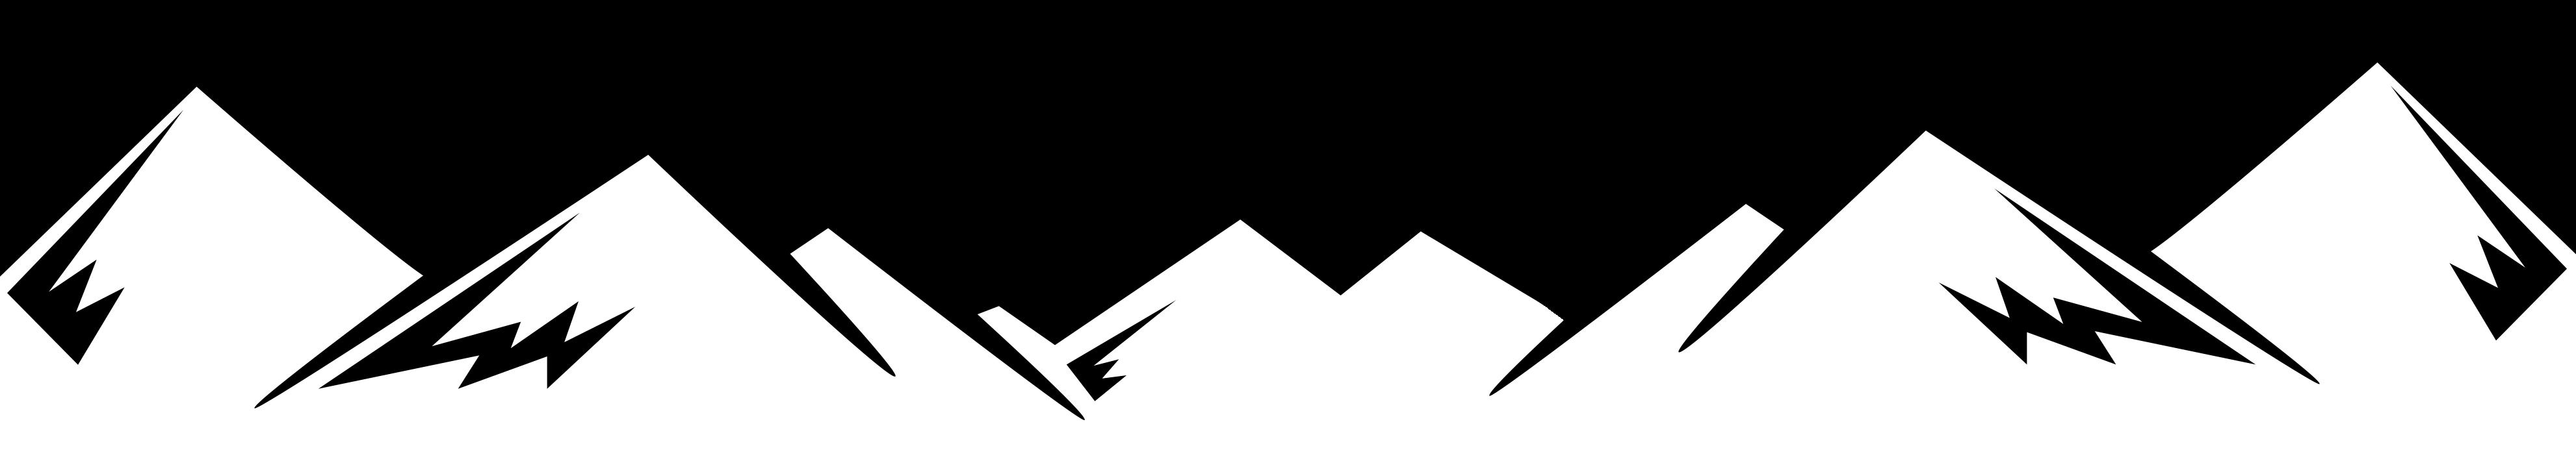 Mountain Hot Tub Bozeman Butte Helena Mt